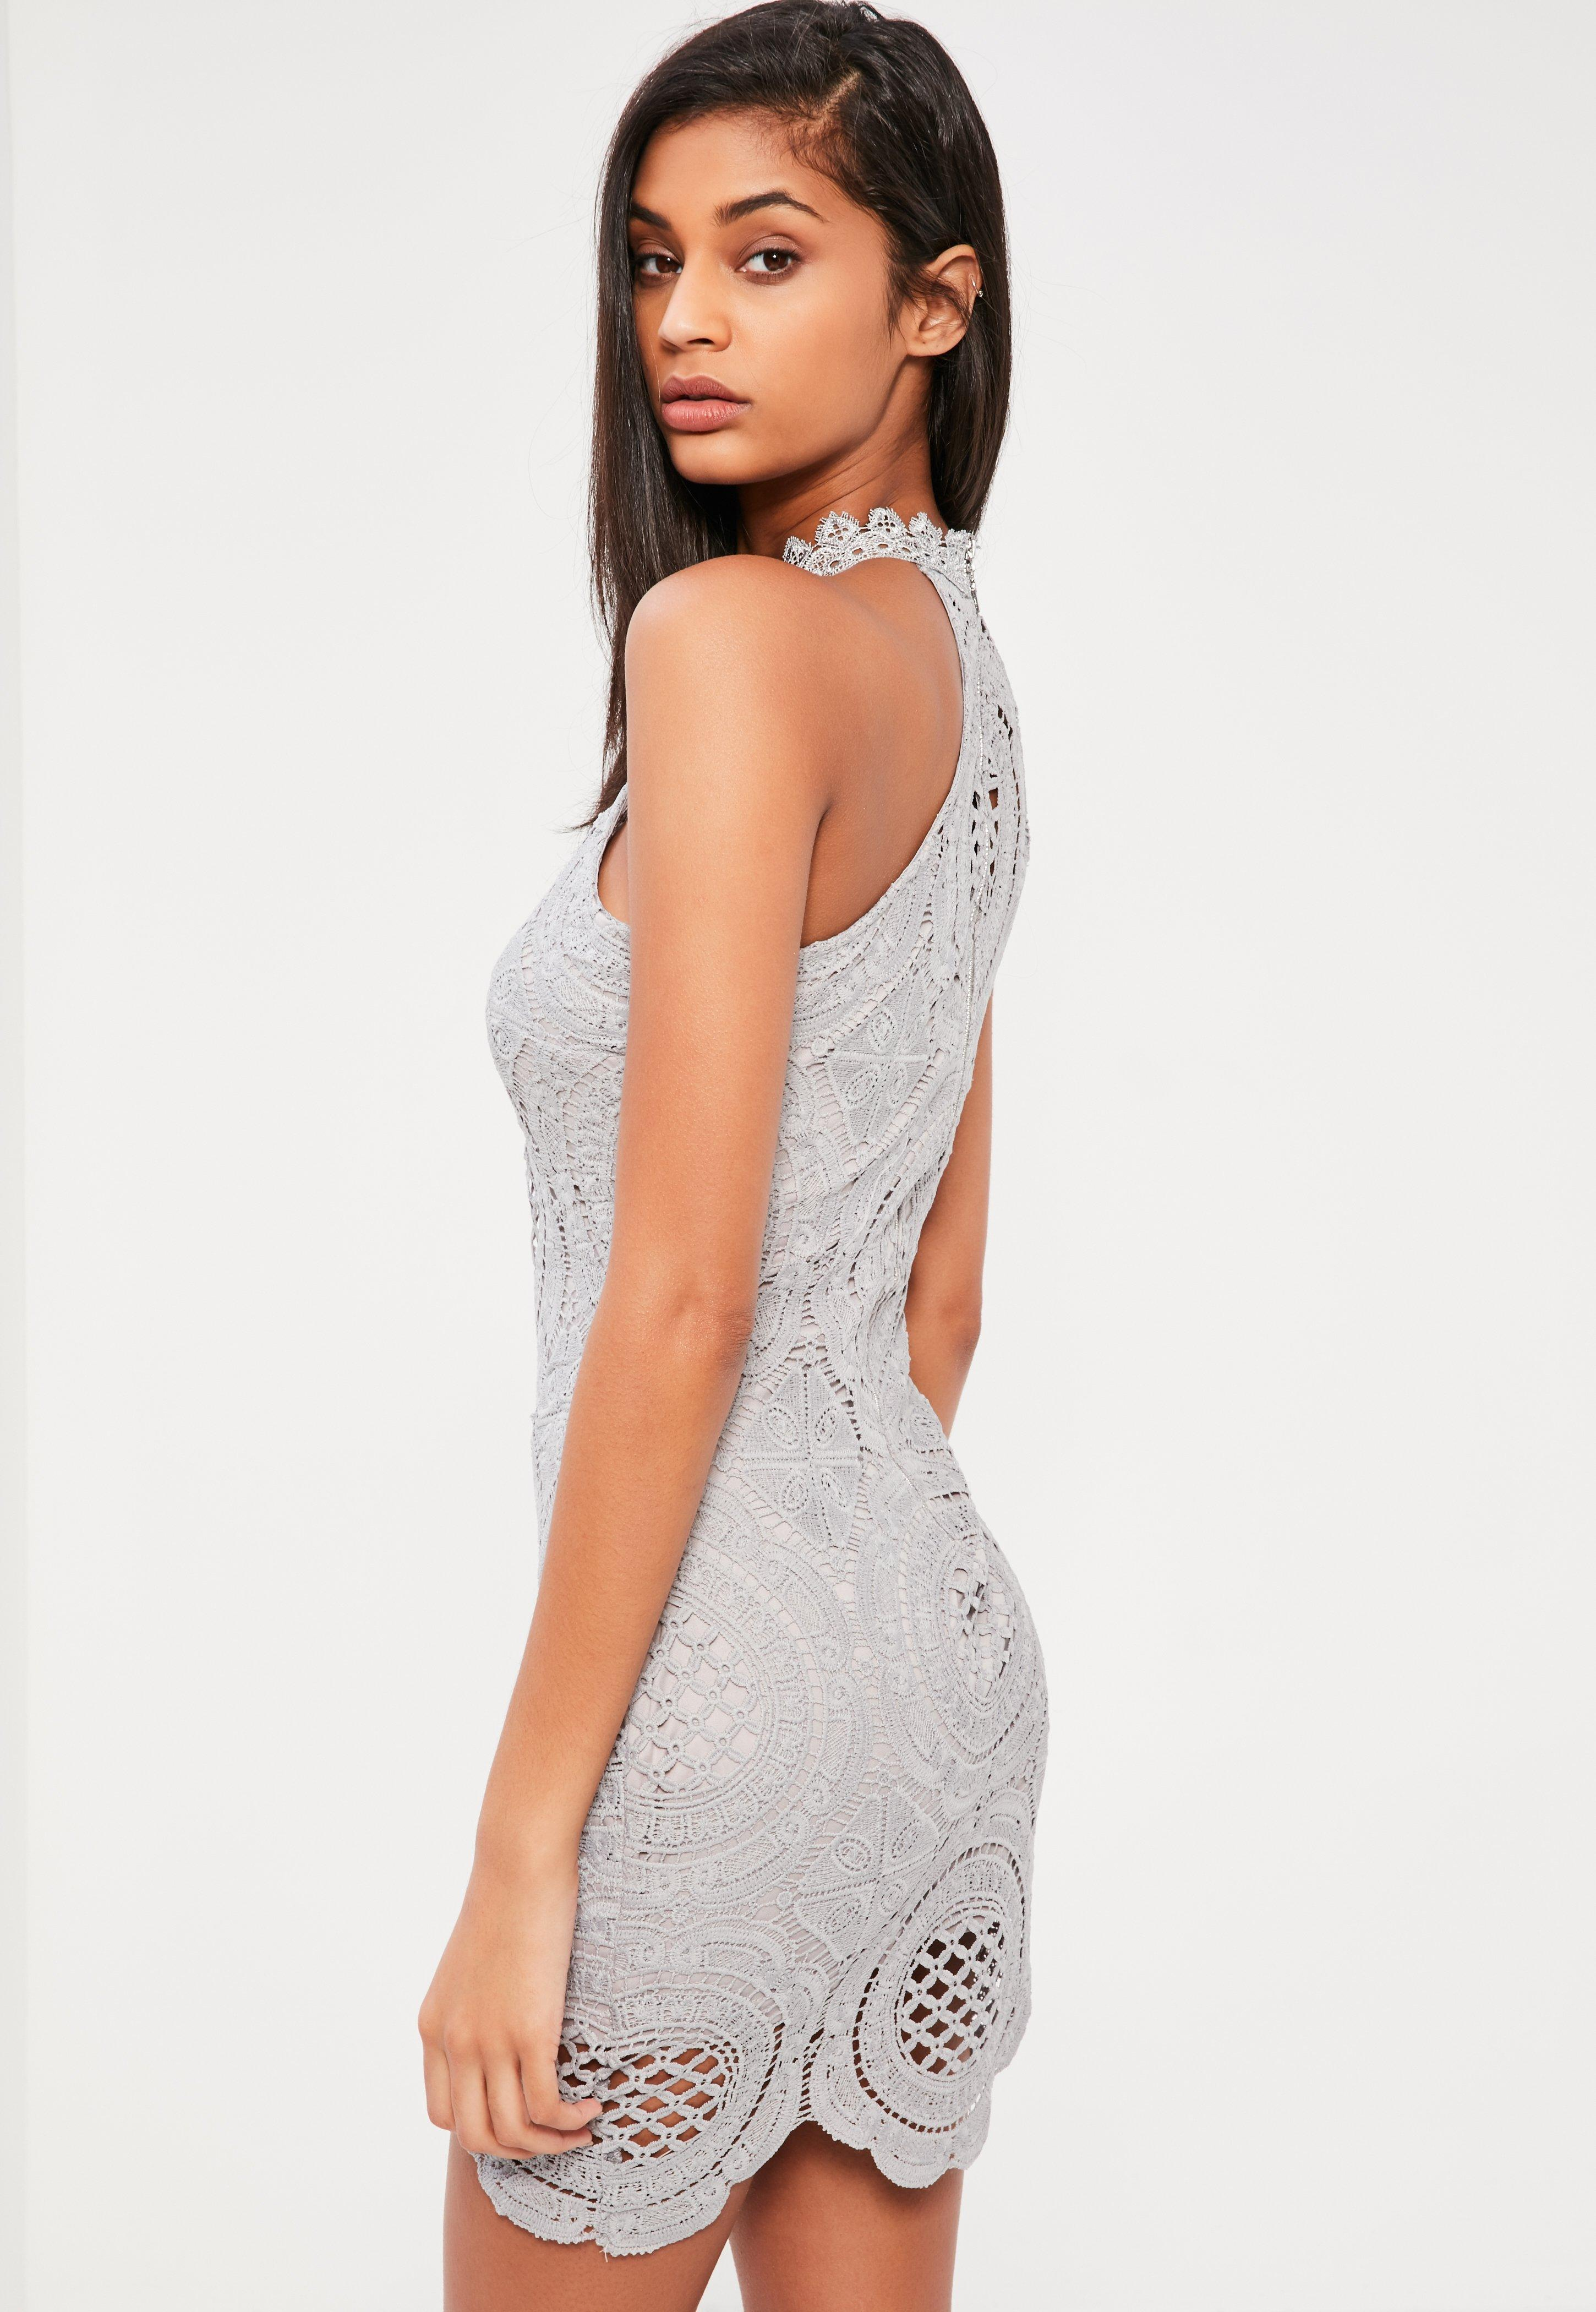 Strapless bodycon dress pattern